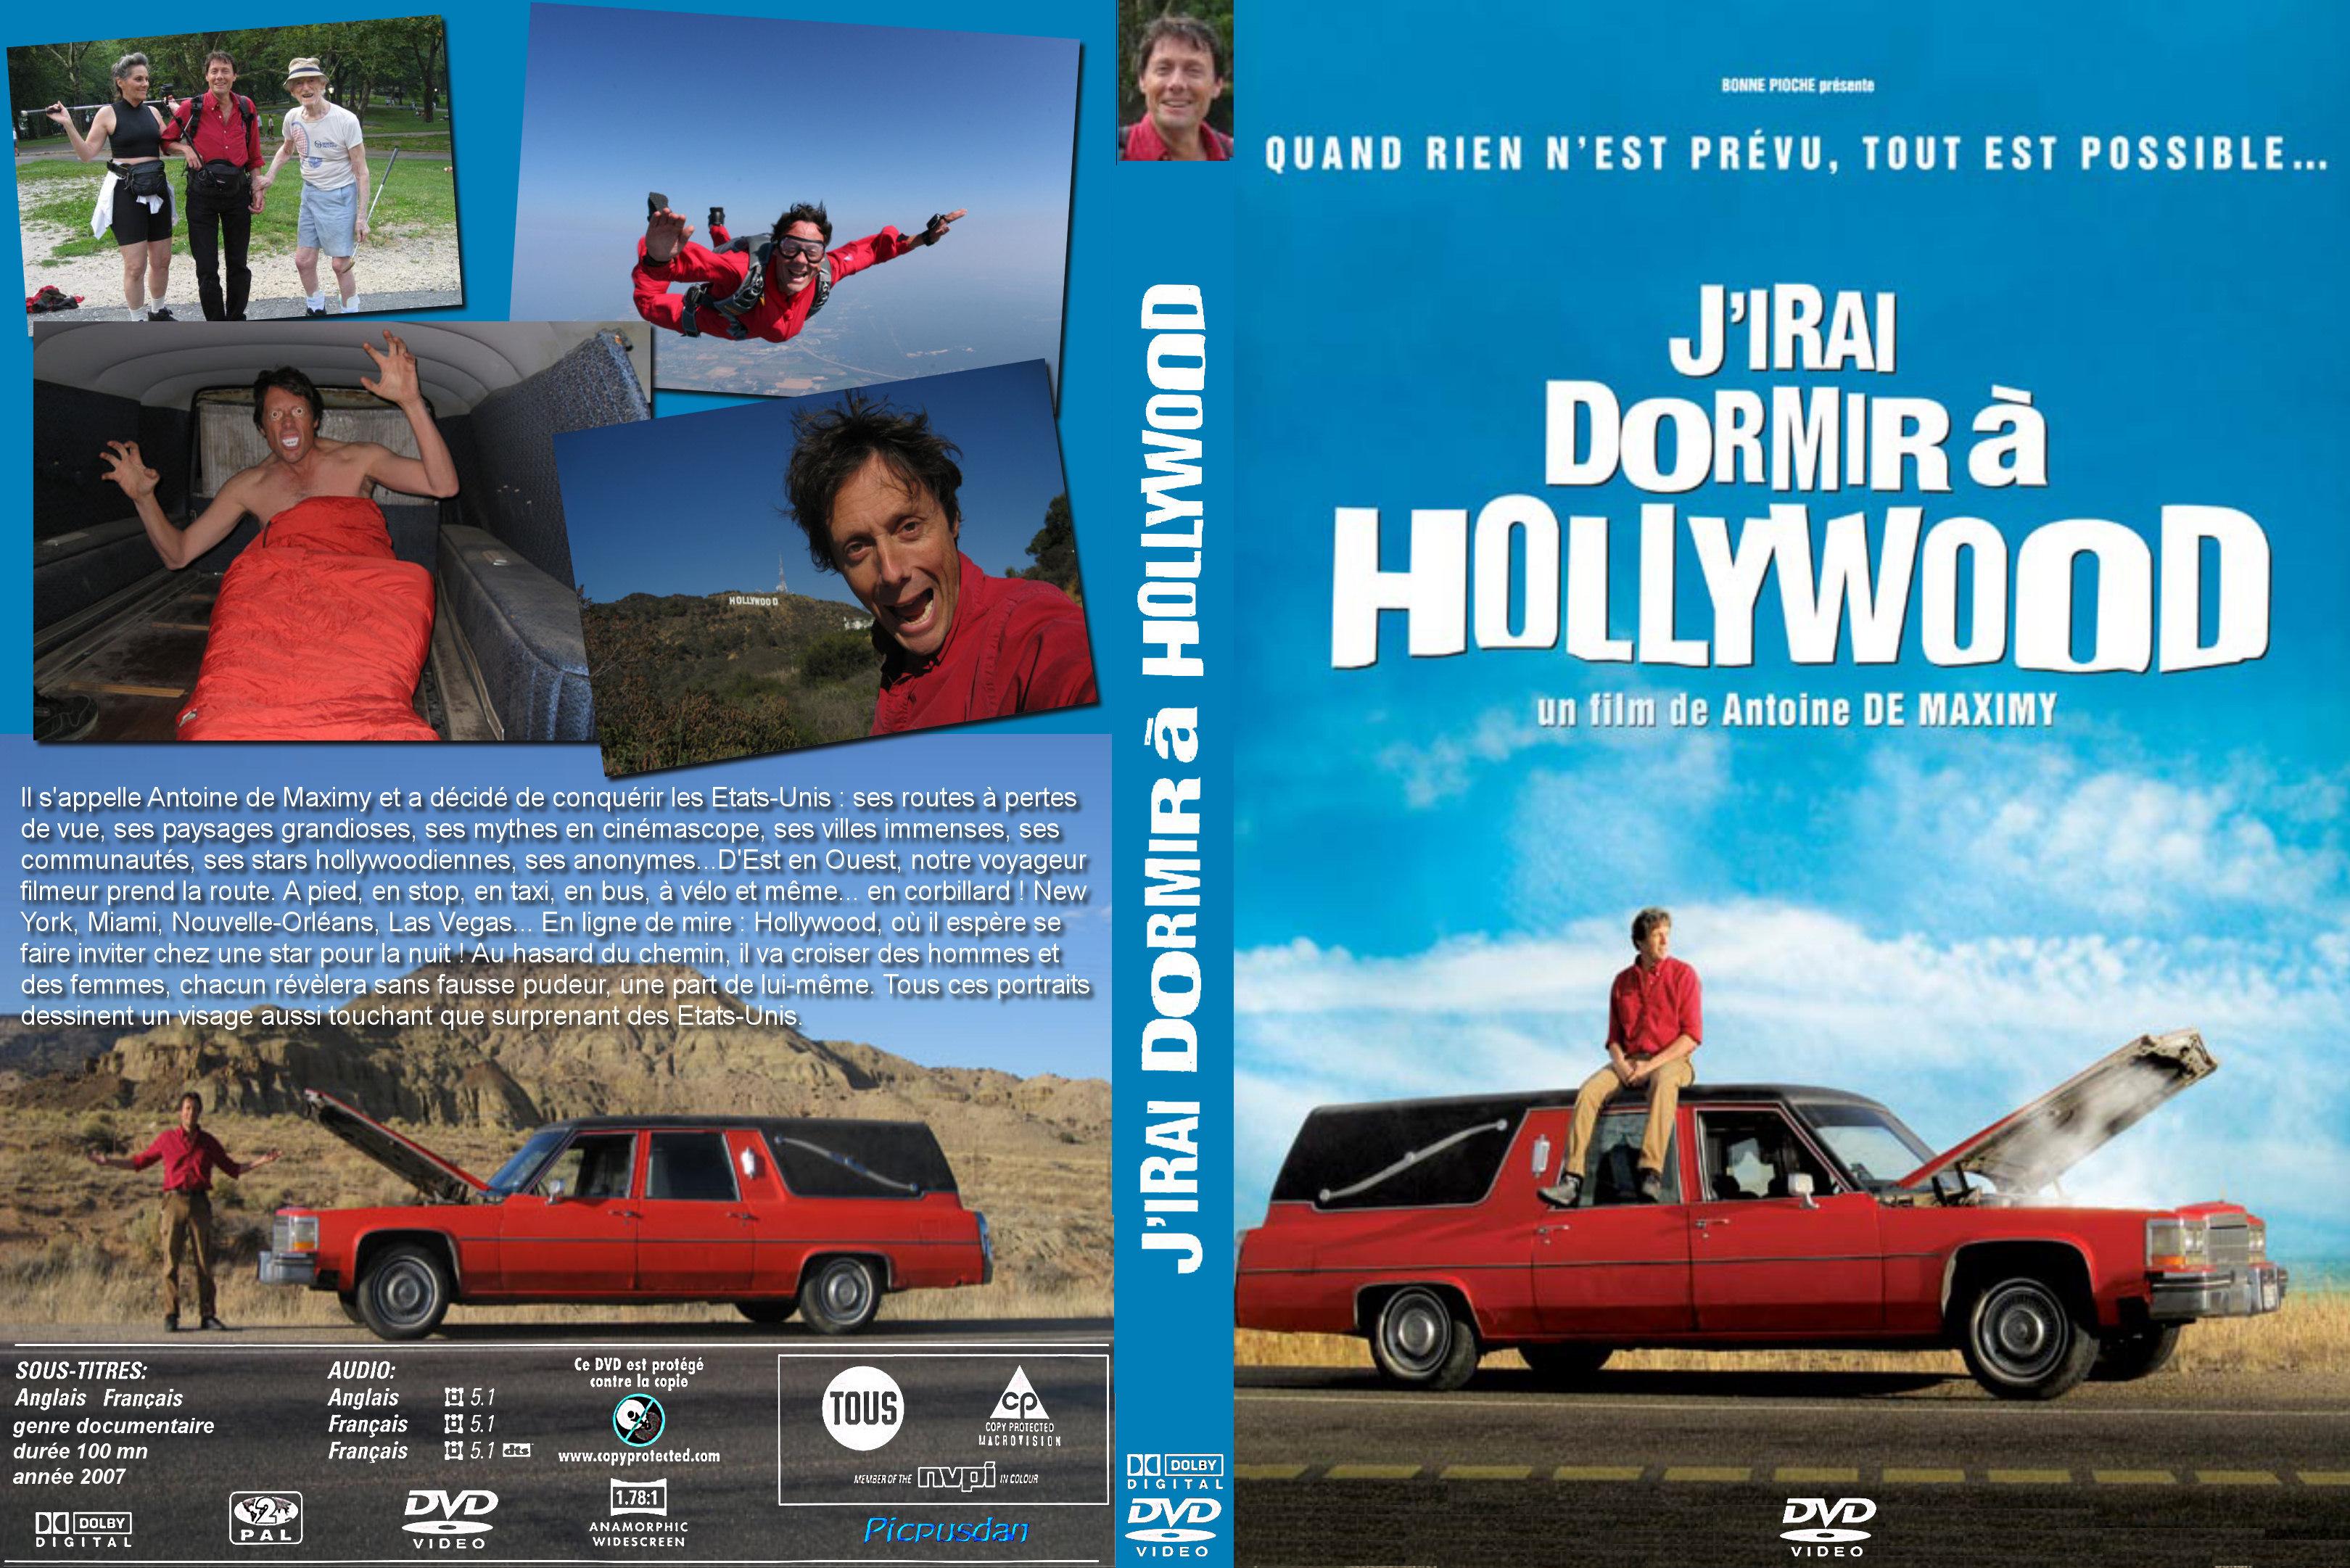 J'Irai Dormir A Hollywood Dvdrip 9